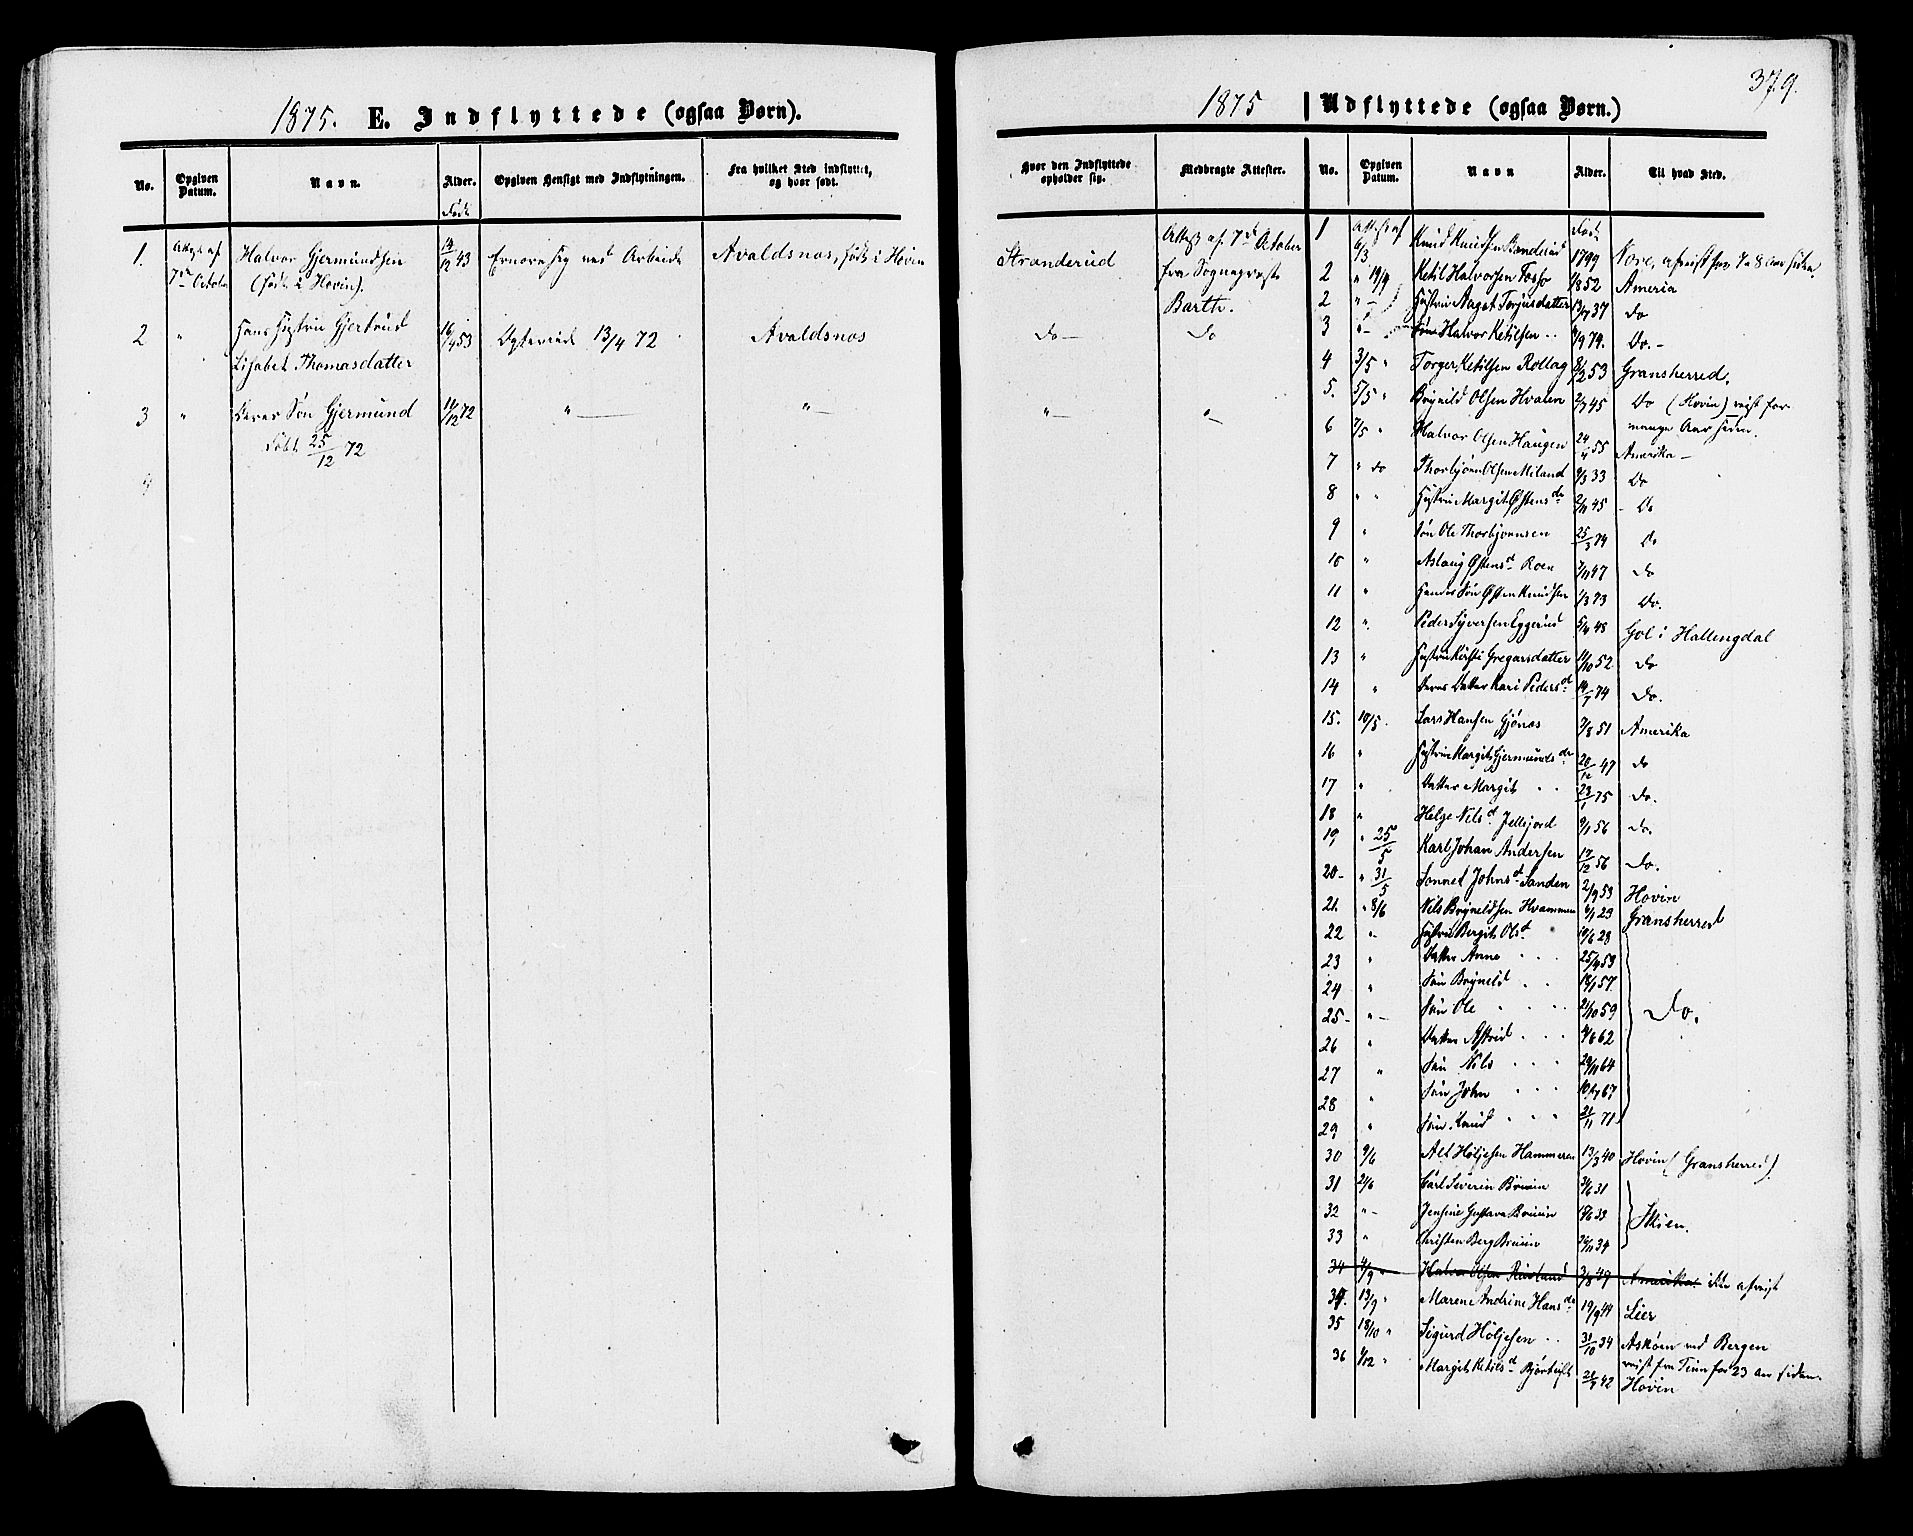 SAKO, Tinn kirkebøker, F/Fa/L0006: Ministerialbok nr. I 6, 1857-1878, s. 379